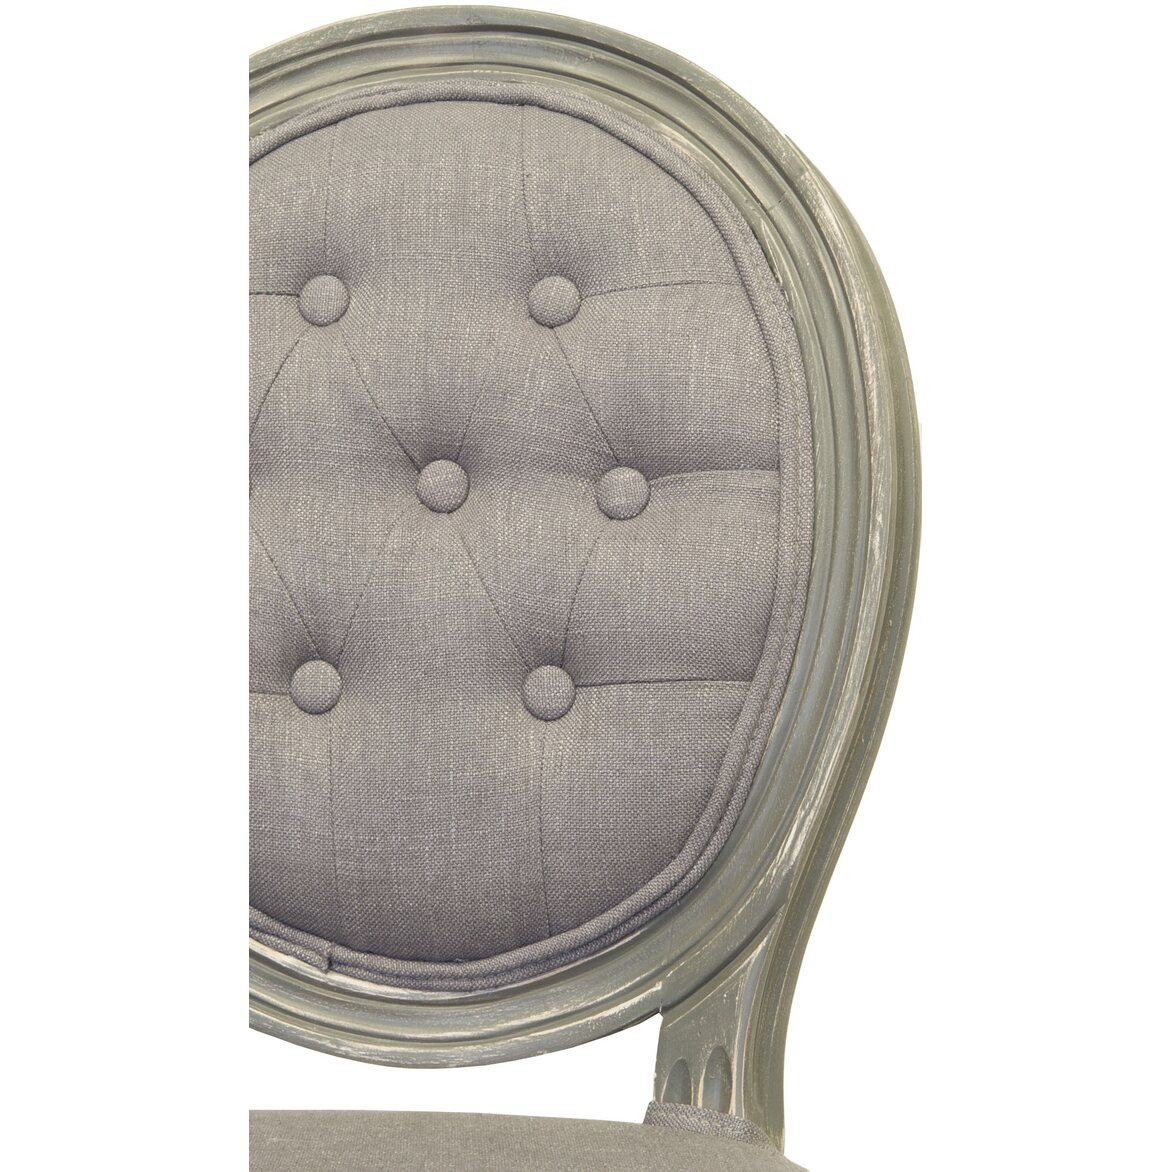 Стул Volker button grey 5 | Обеденные стулья Kingsby